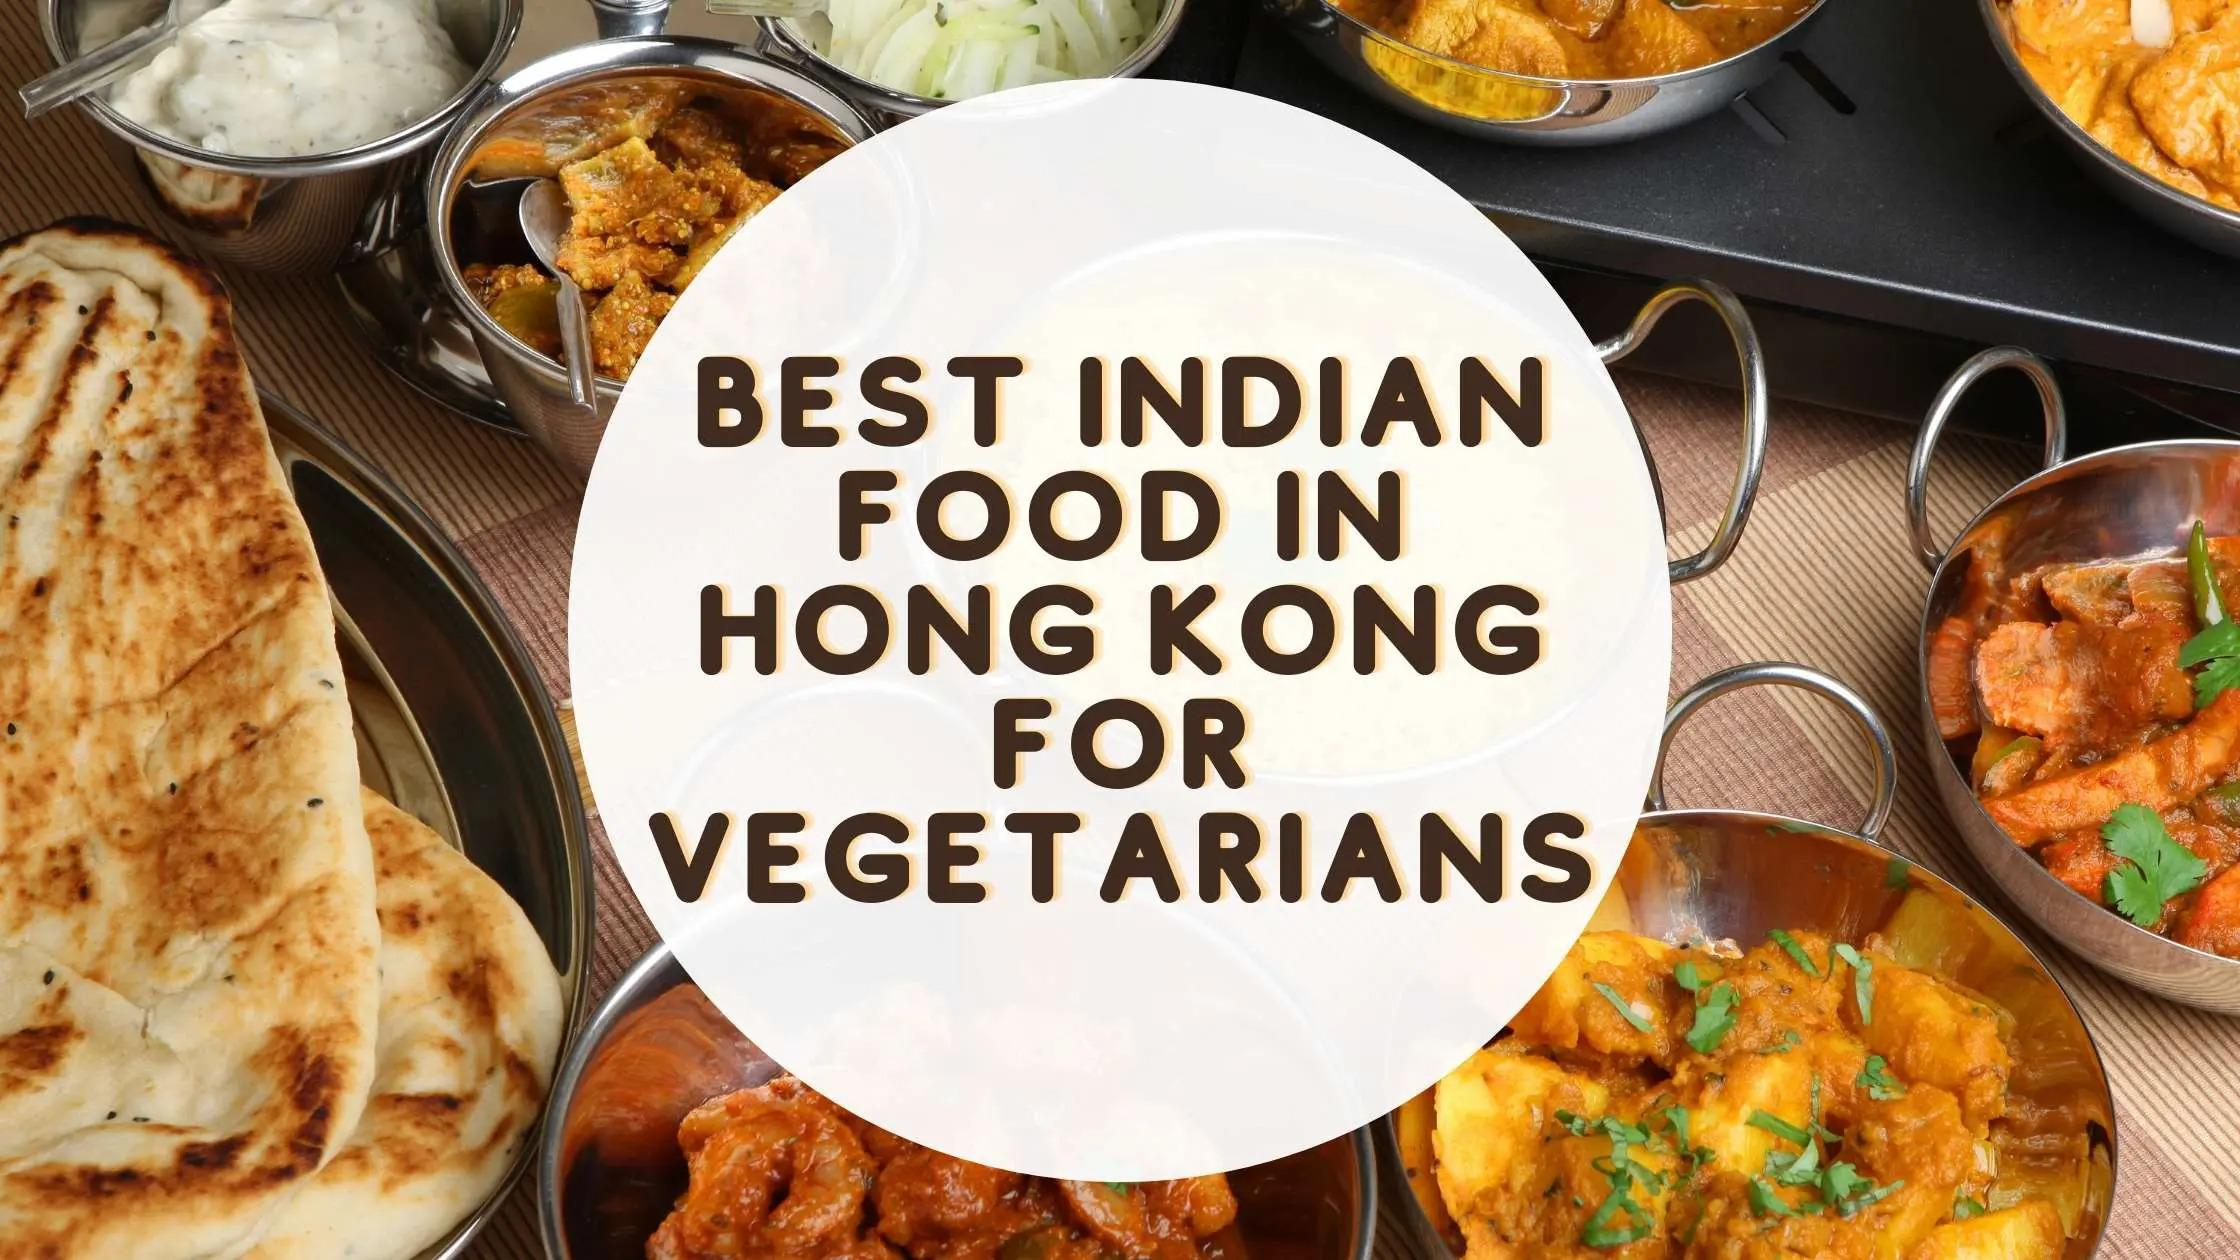 BEST INDIAN FOOD IN HONG KONG FOR VEGETARIANS 1